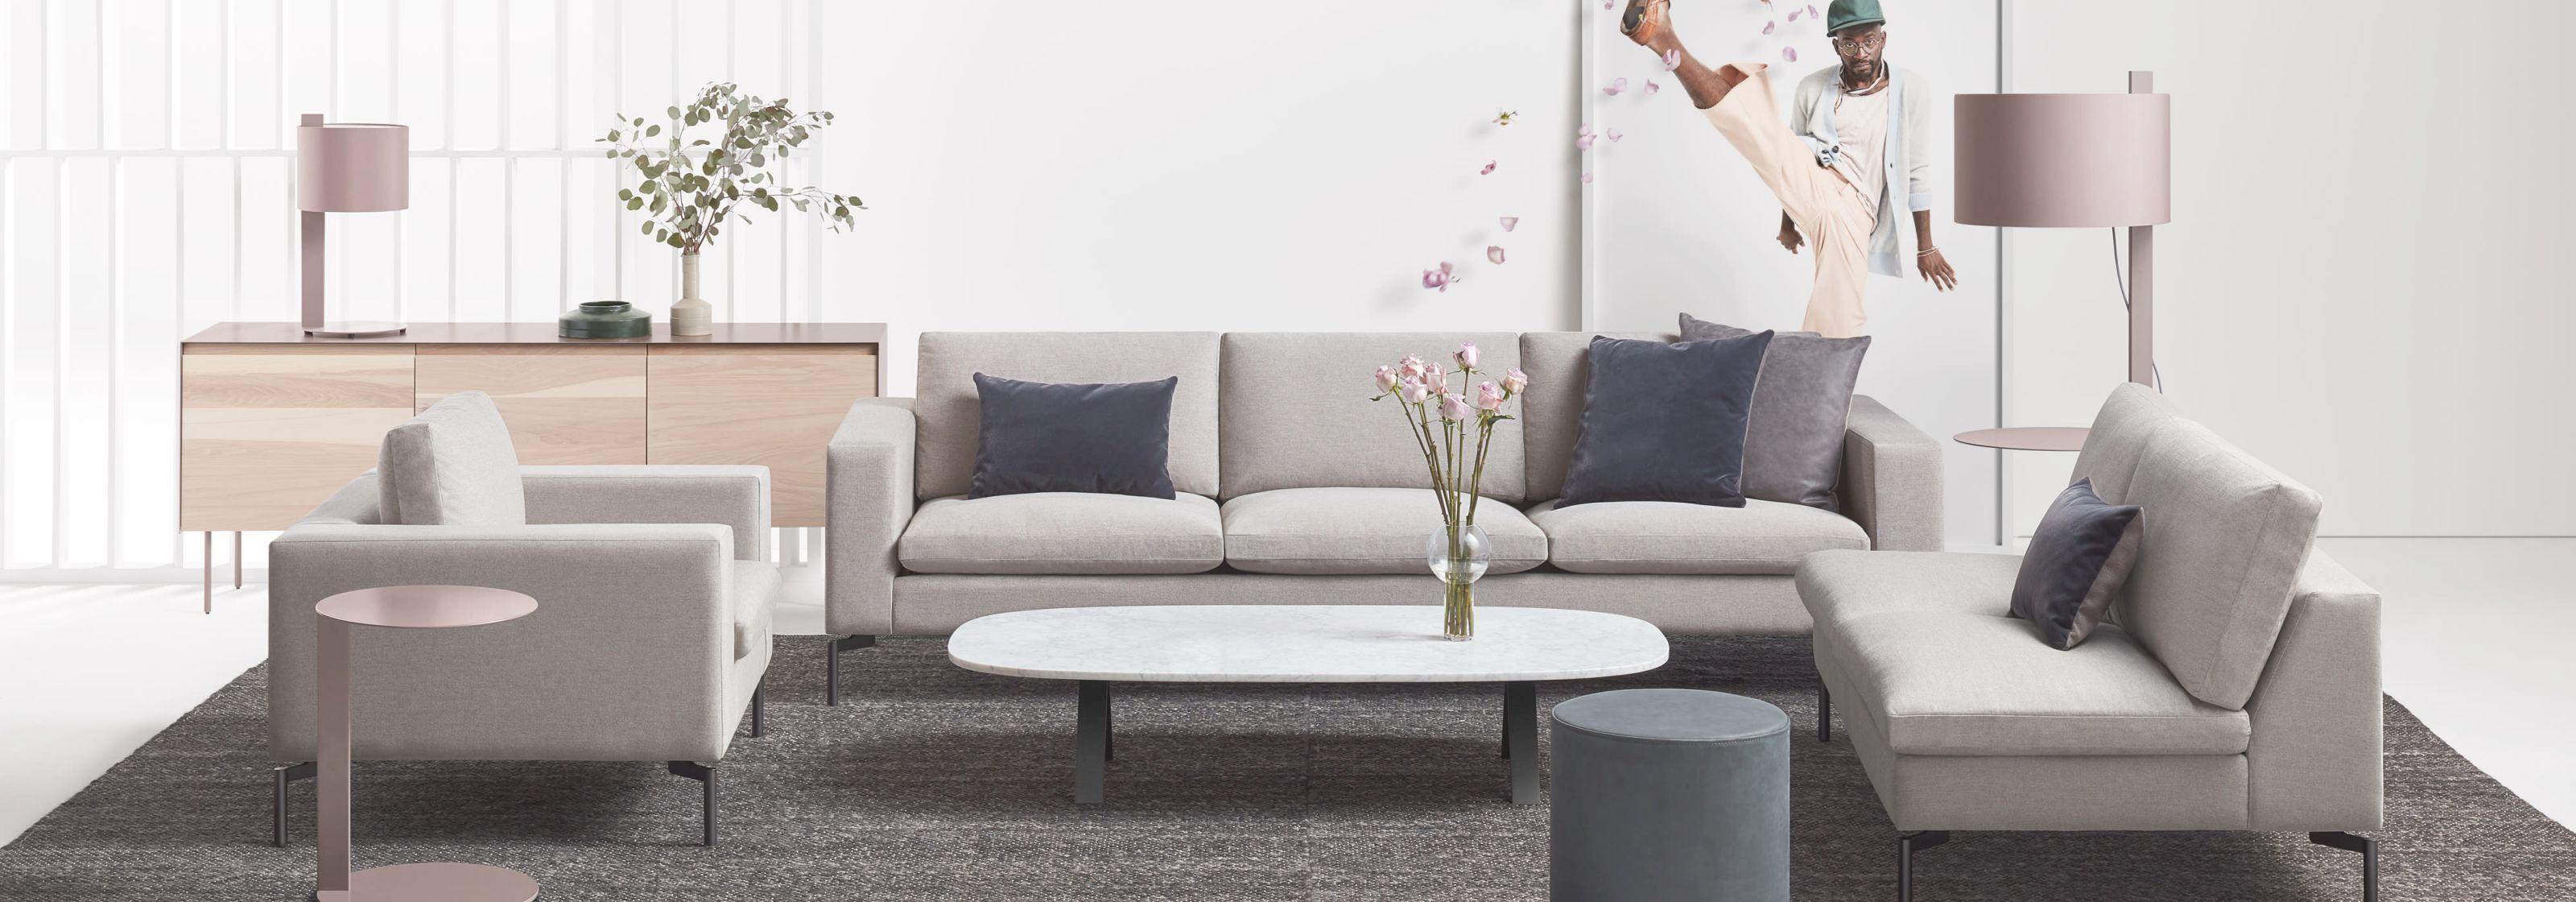 Modern And Contemporary Sofas - Modern Living Room Furniture with Designer Living Room Furniture